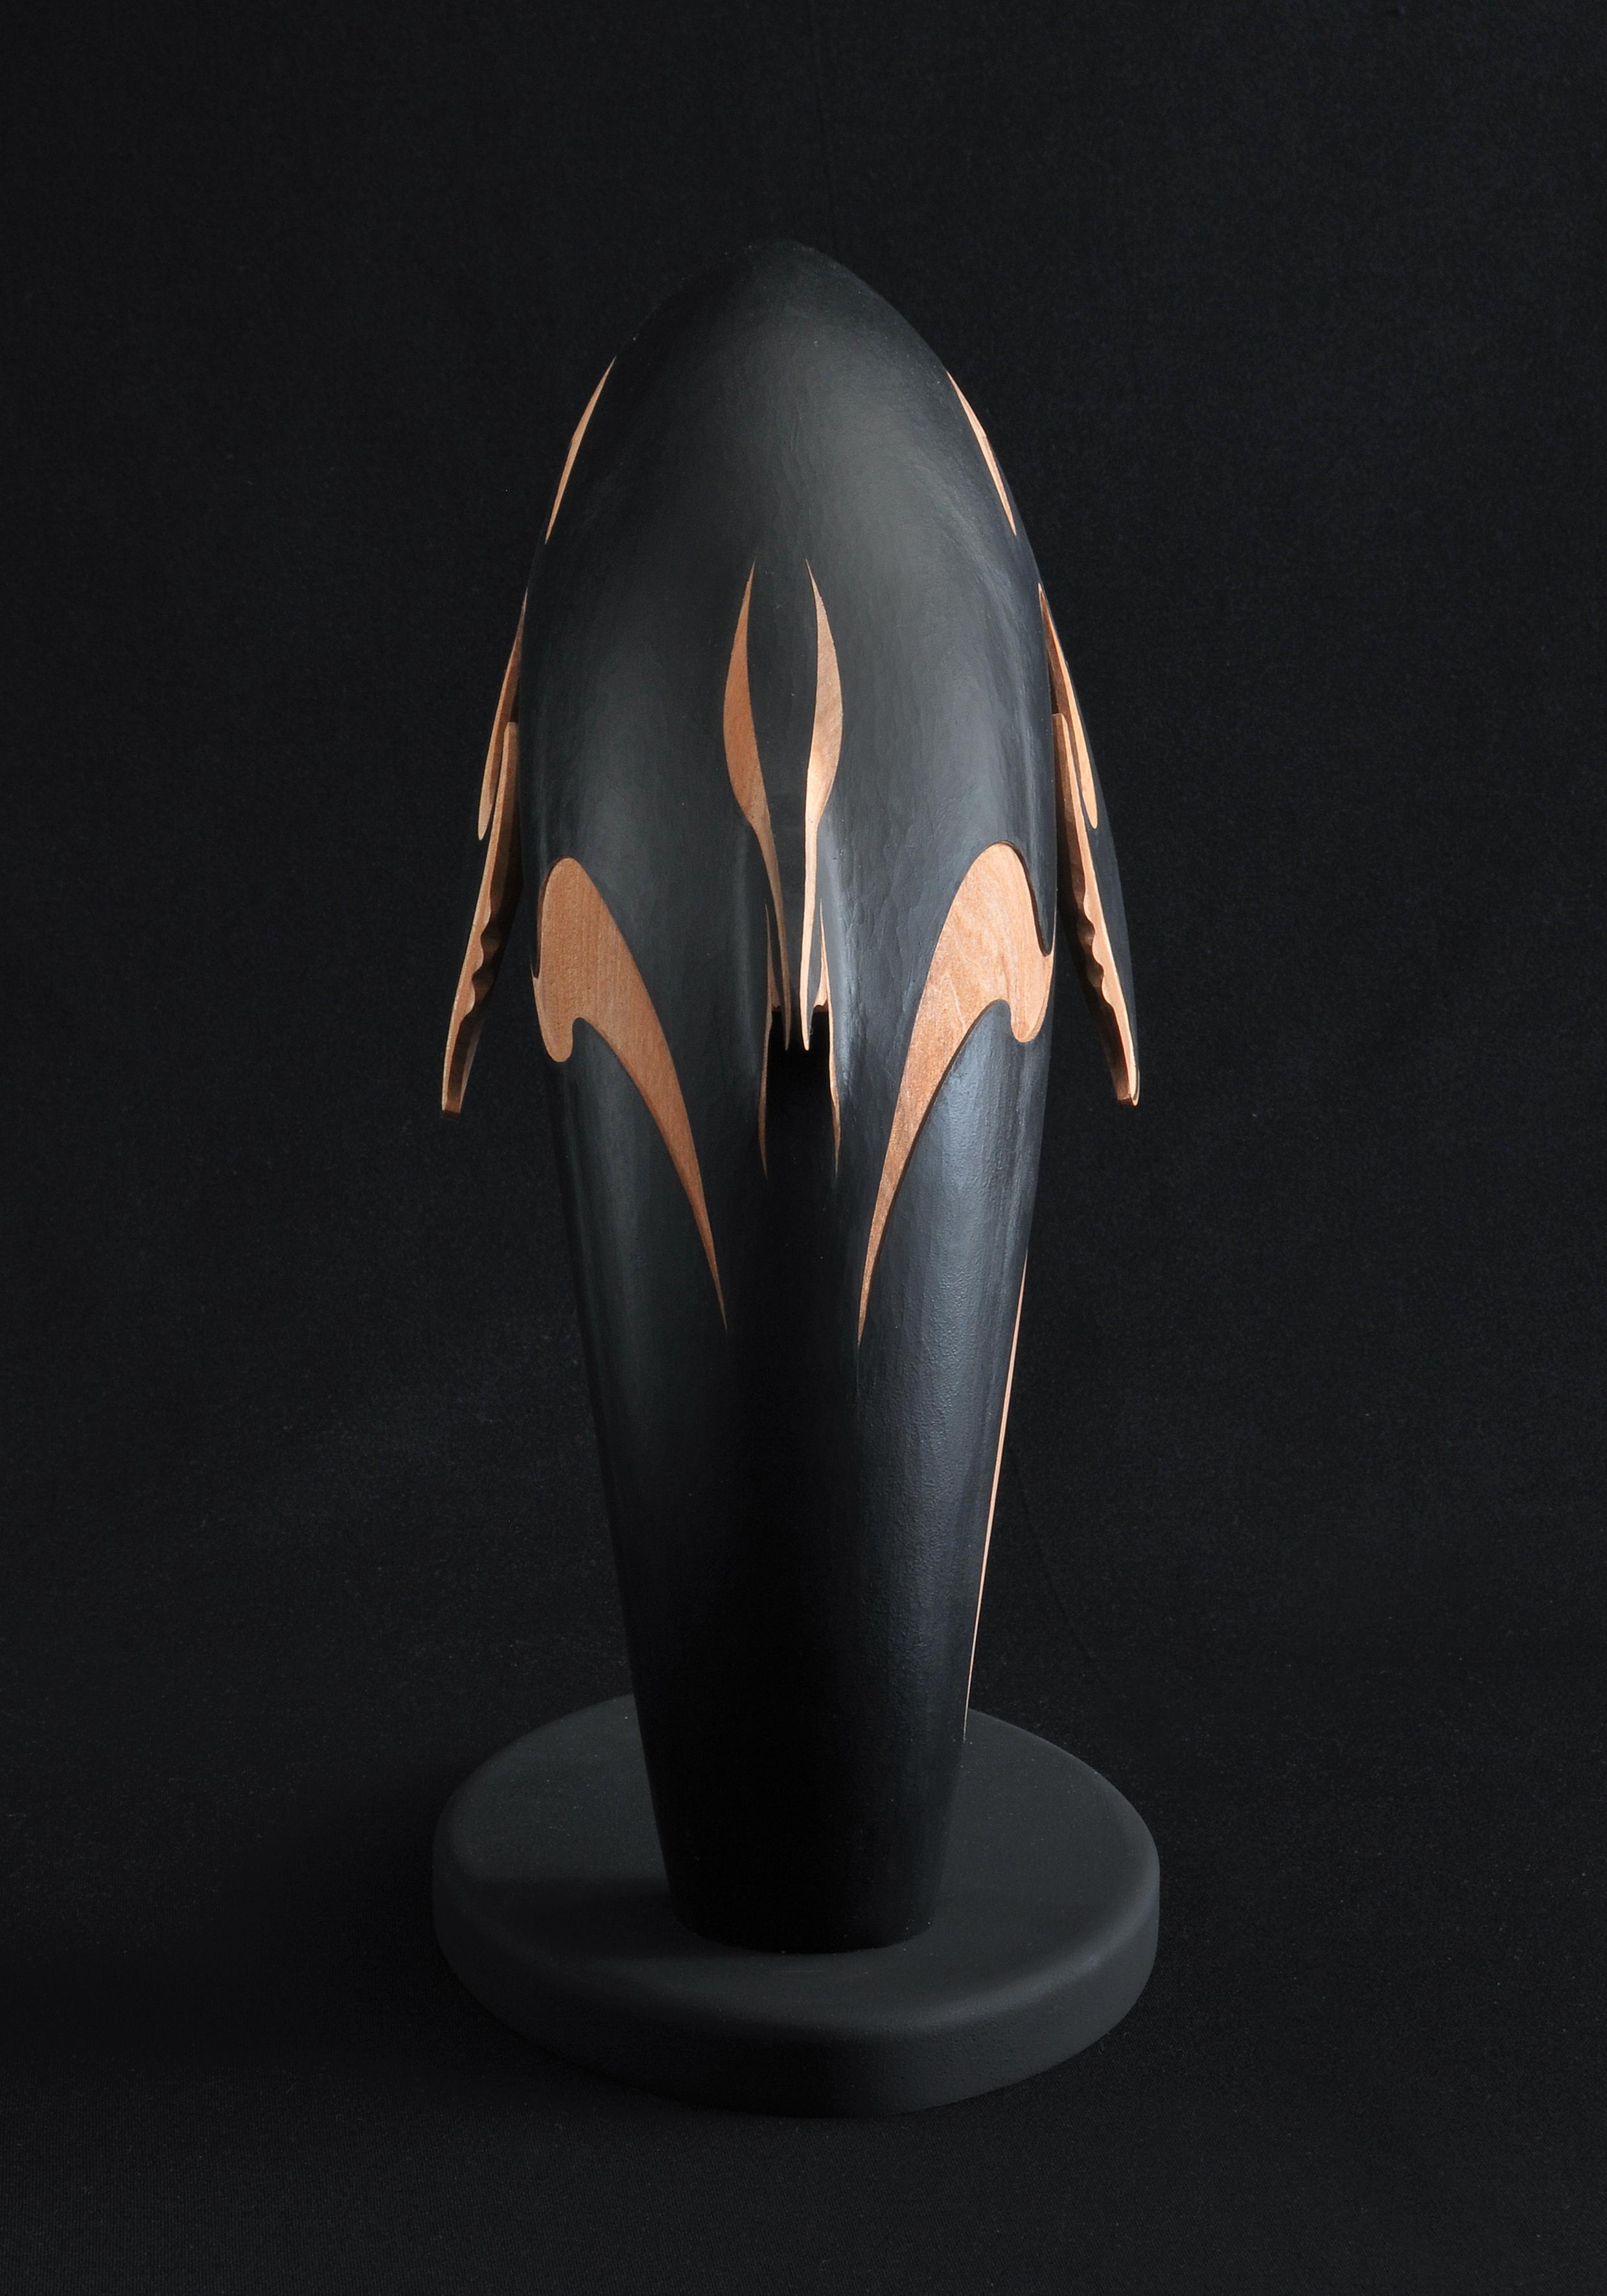 Tutara kauika  (guardian whale)